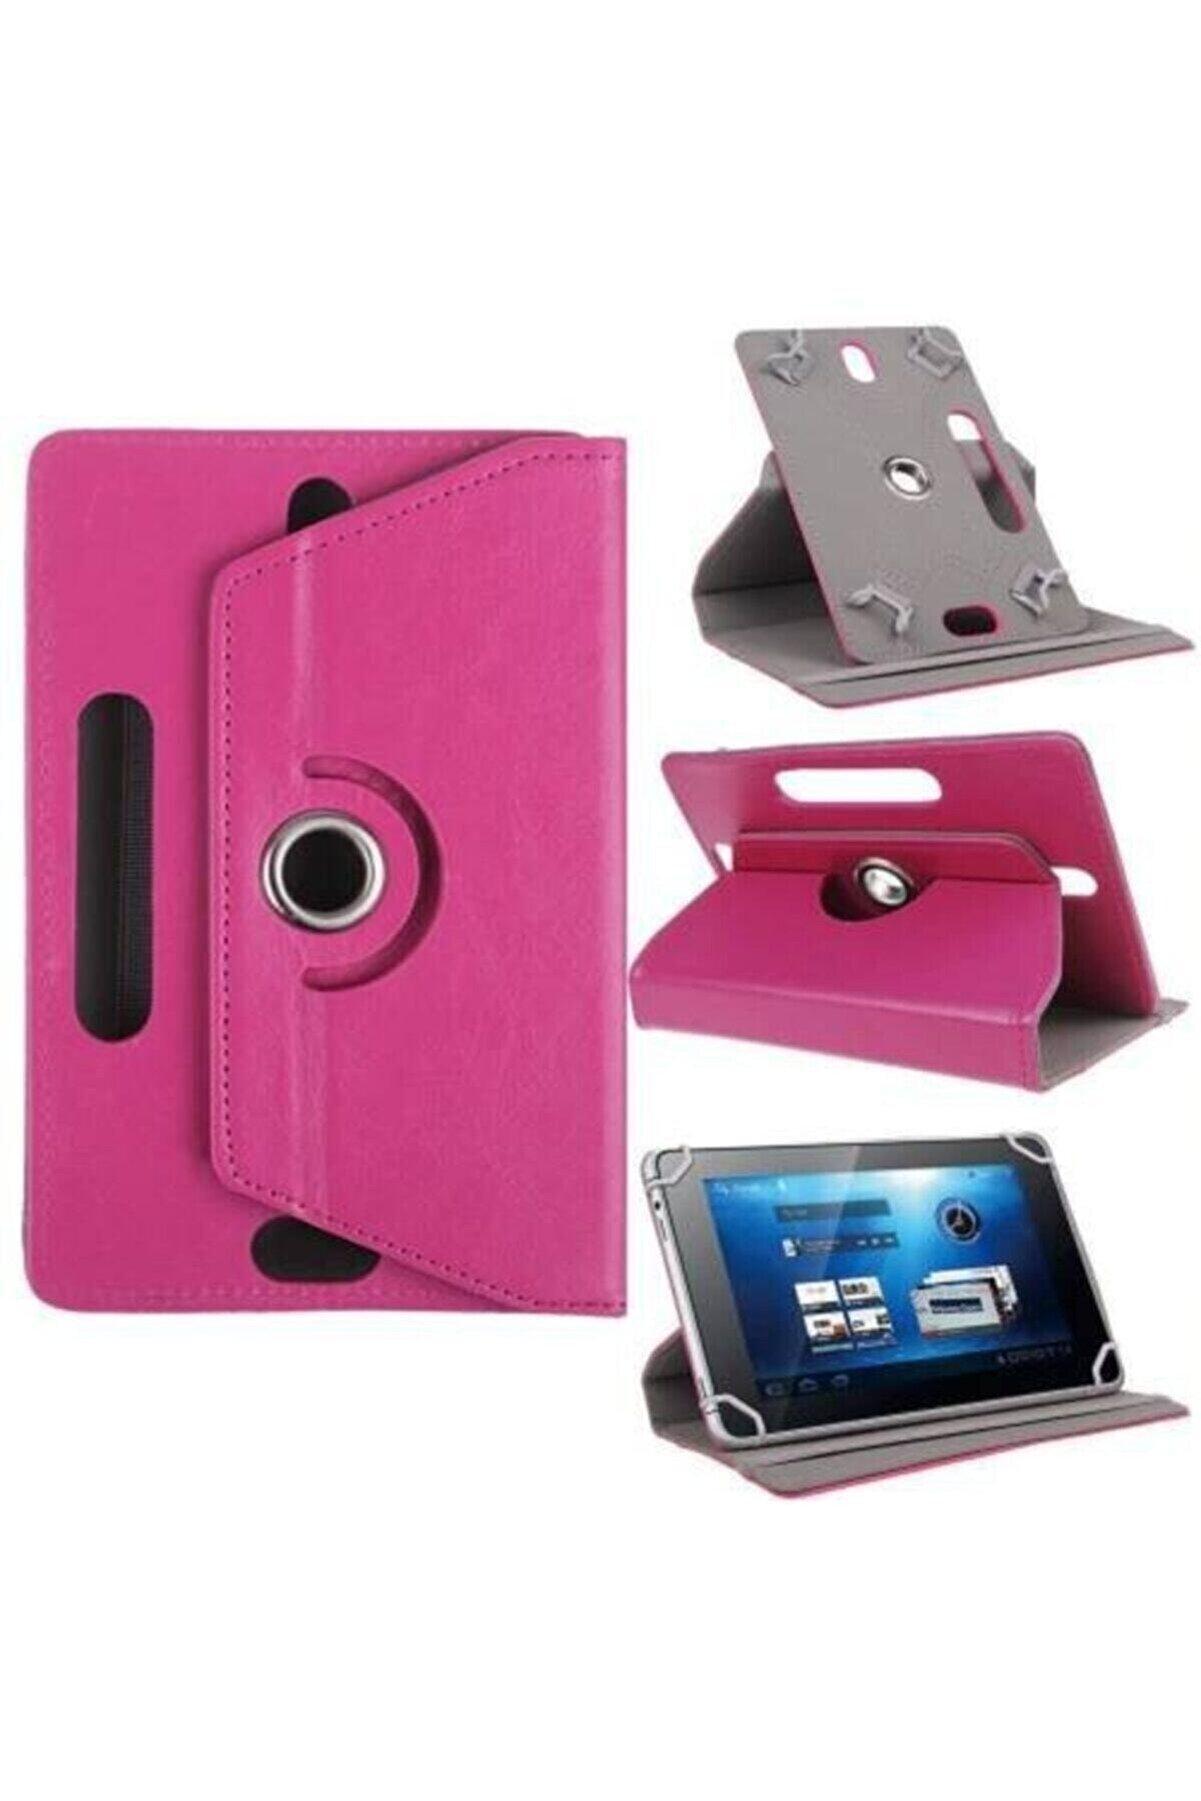 KılıfShop Mobillan Iletişim Pembe Hometech Alfa 7m 7'' Inç Üniversal Stand Olabilen Tablet Kılıf